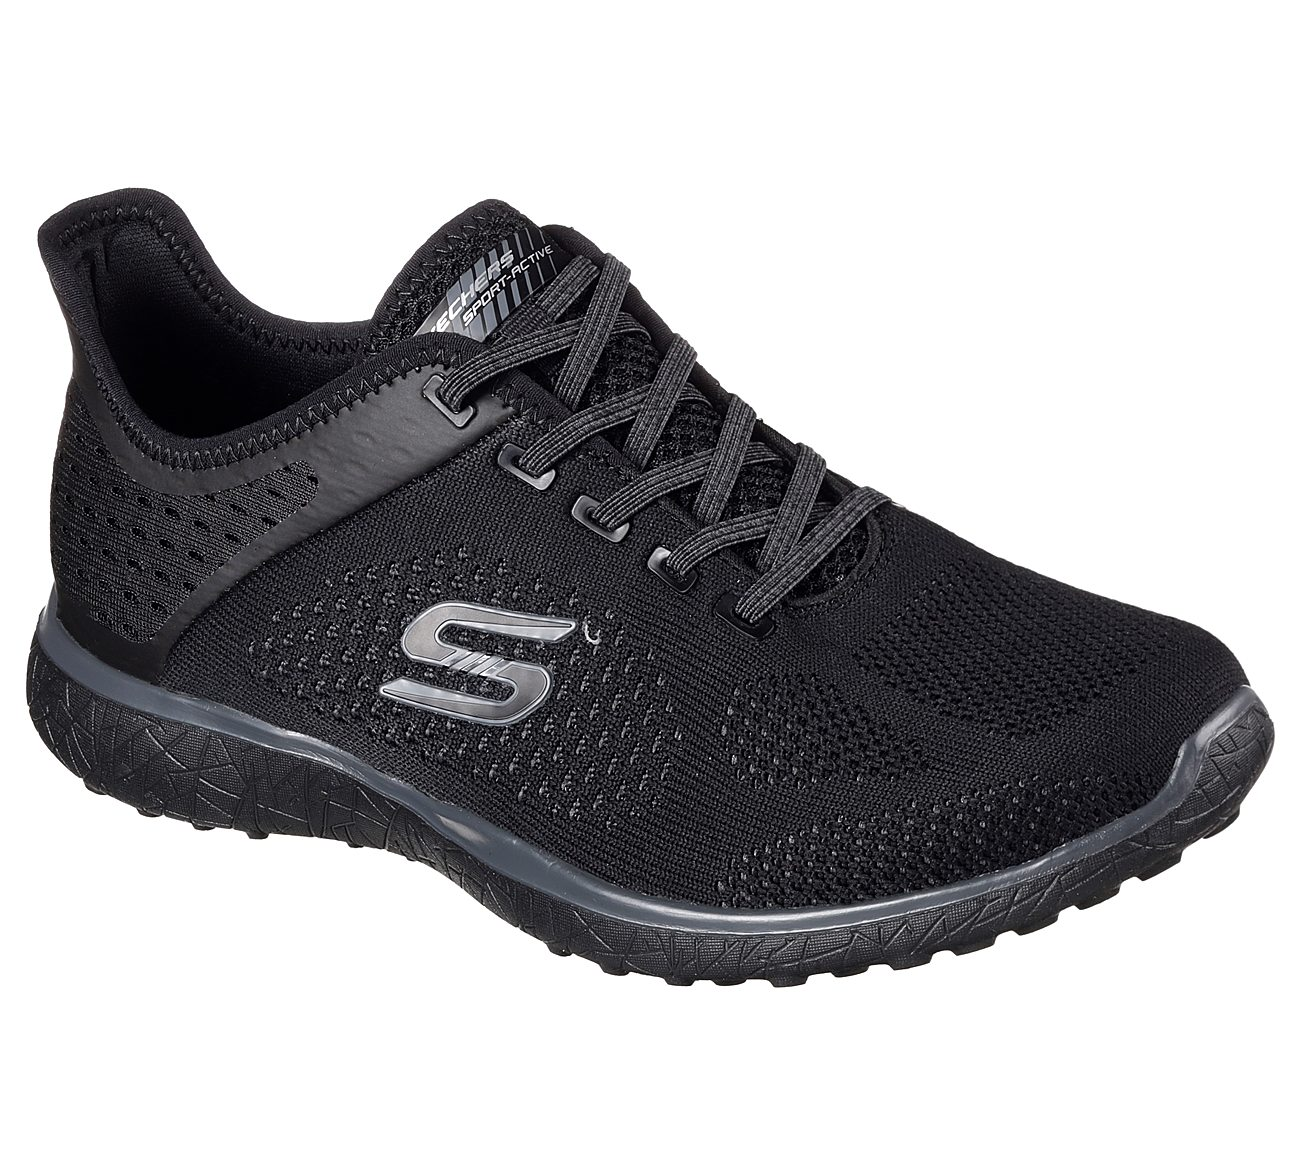 Skechers Damen Microburst 23327-Bbk Sneaker